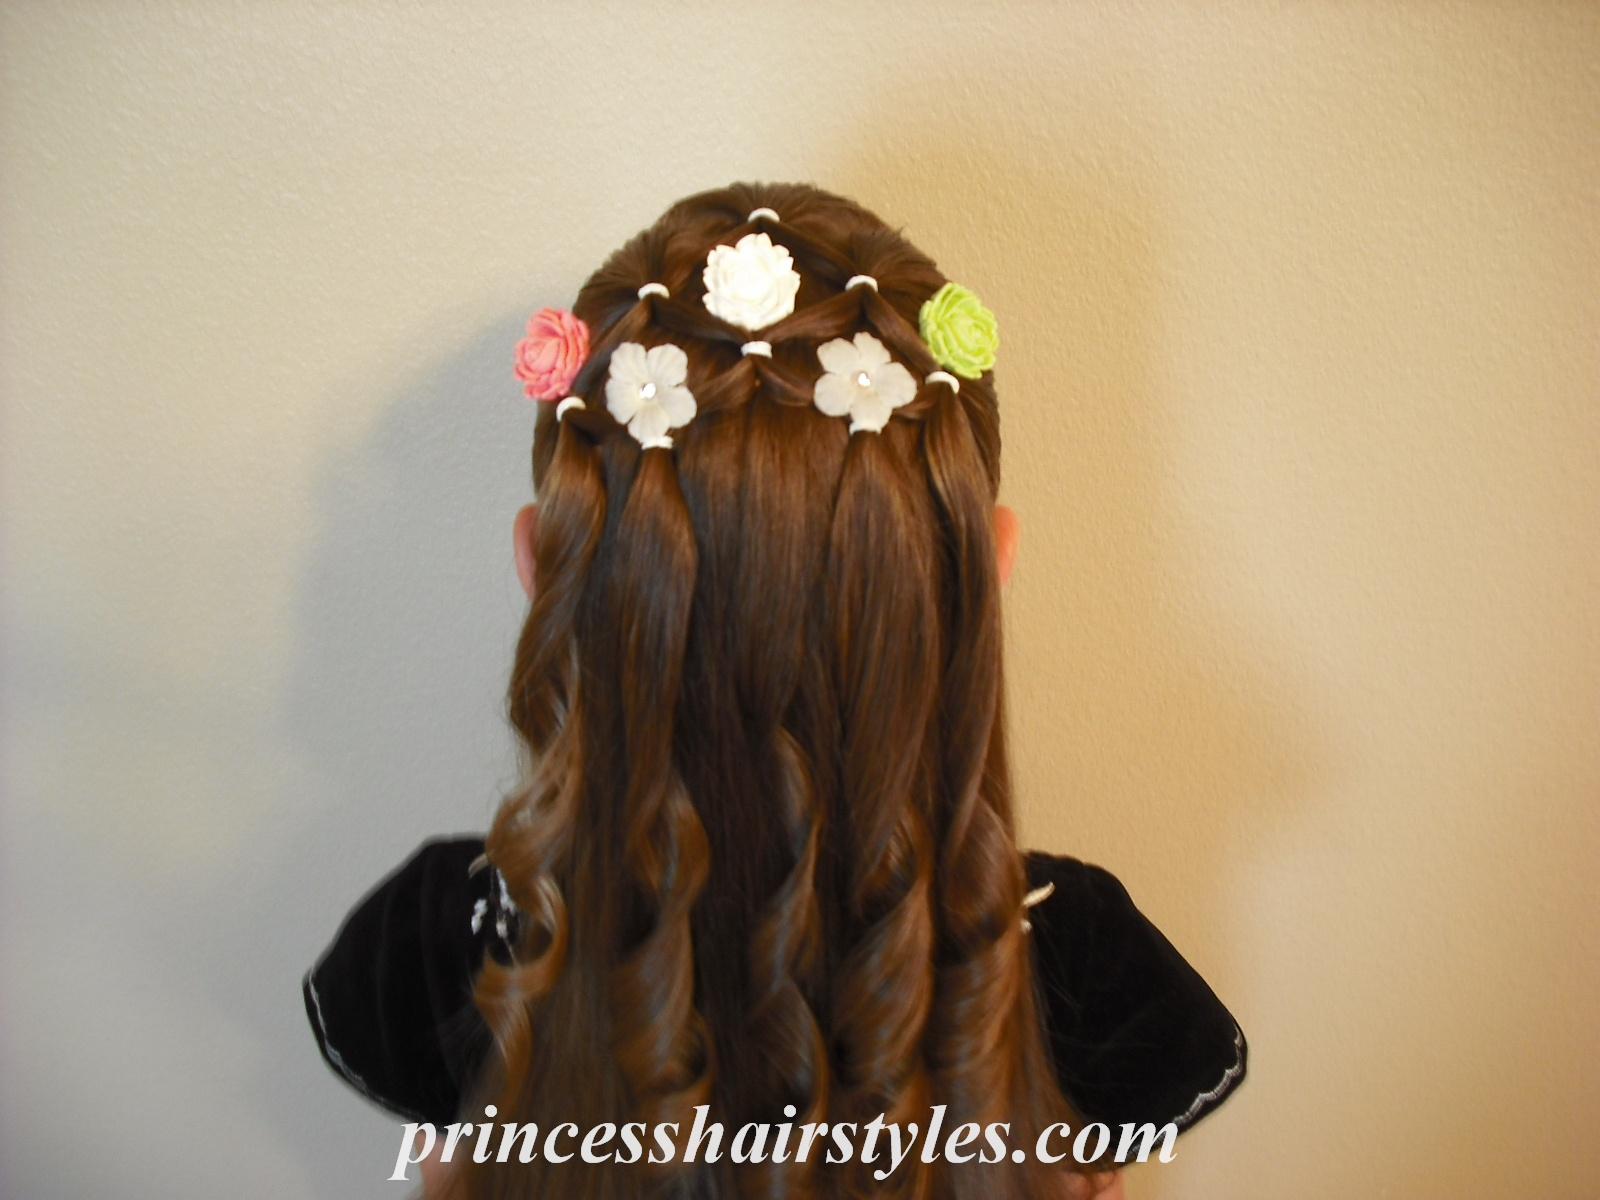 Flower Girl Hairstyles For Wedding: Flower Girl Hairstyle